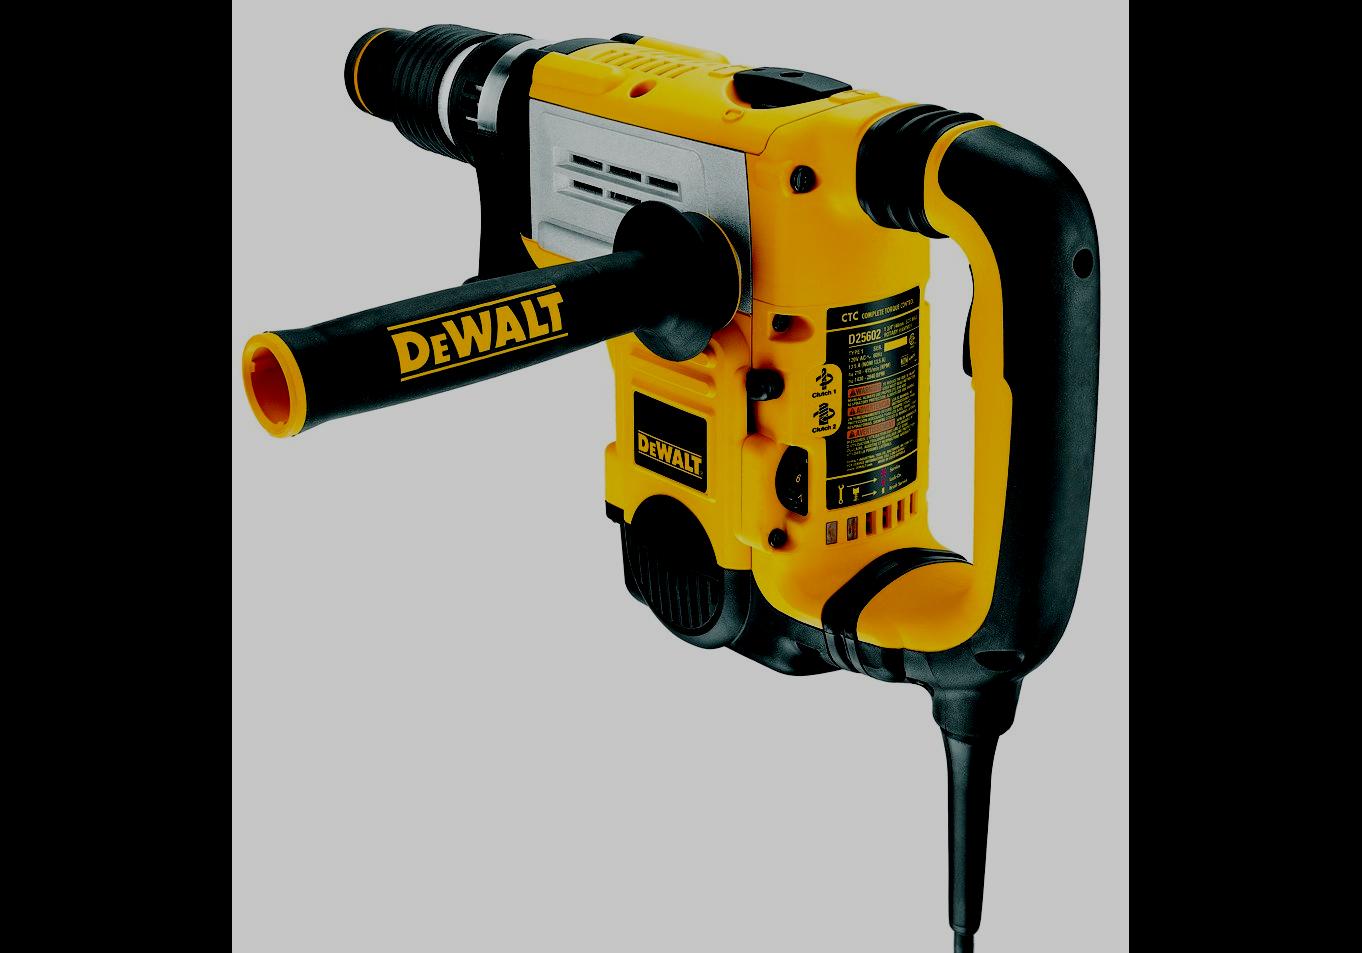 DeWalt D 25602 K